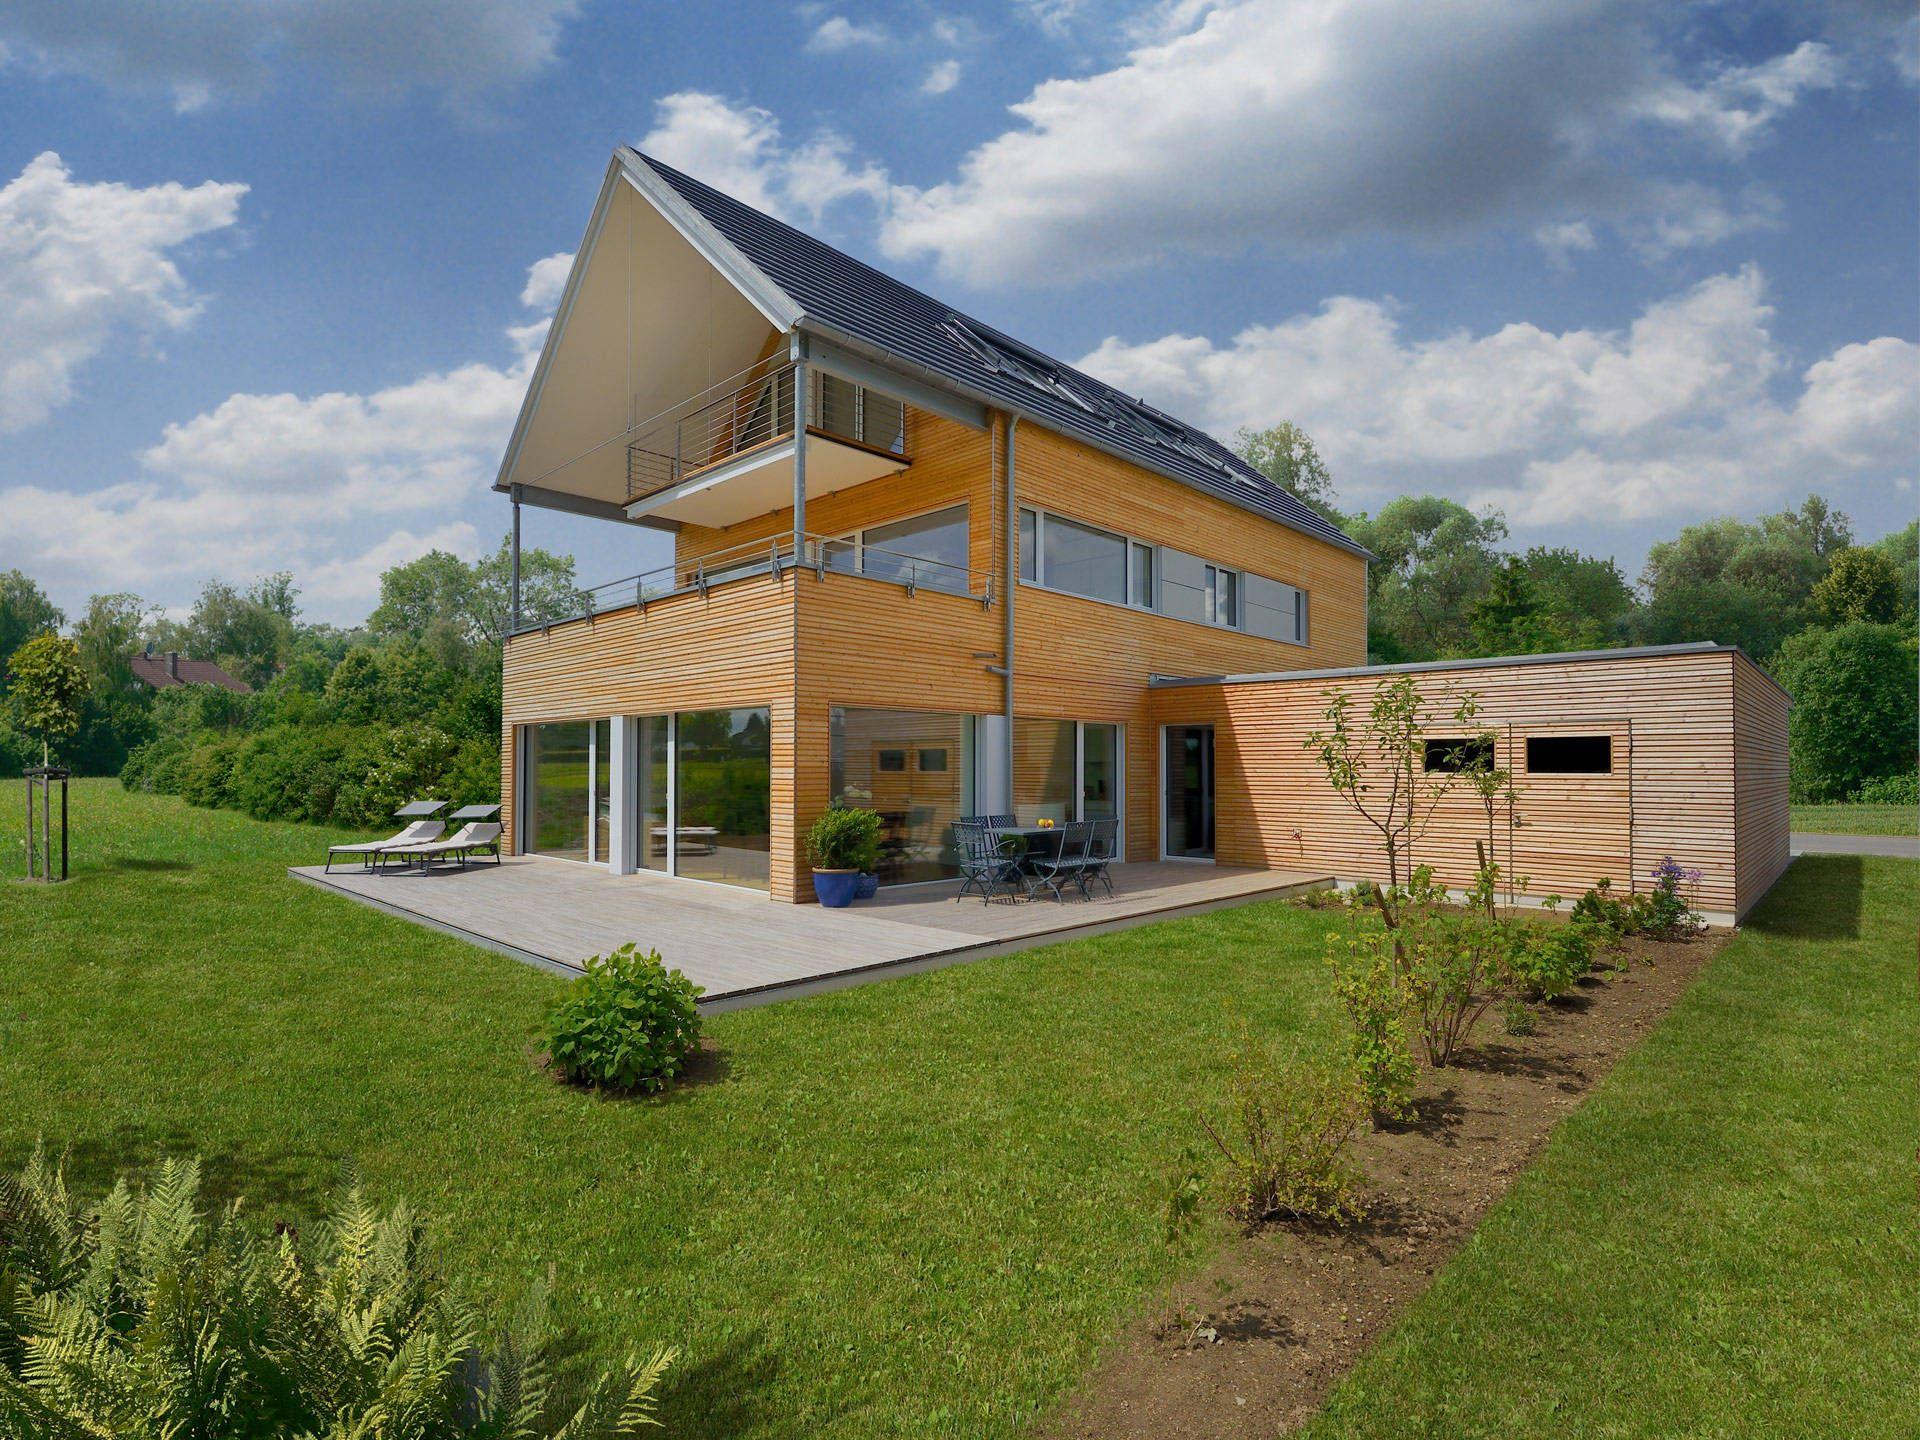 mehrfamilienhaus erstling von baufritz kologisches. Black Bedroom Furniture Sets. Home Design Ideas